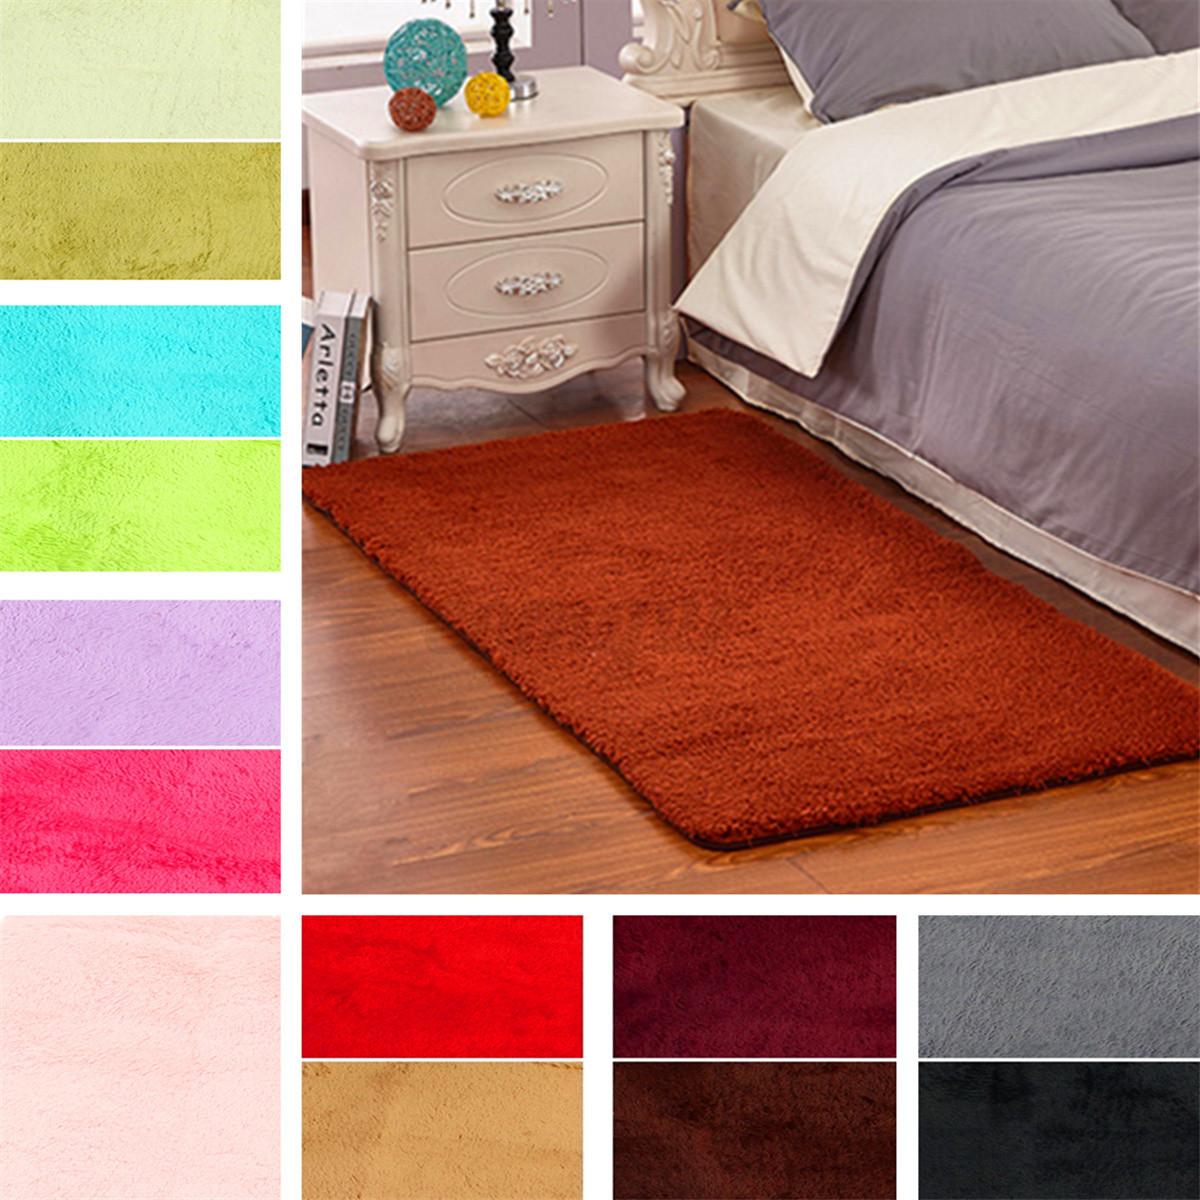 60x120cm Anti Skid Shaggy Fluffy Area Rug Bedroom Carpet